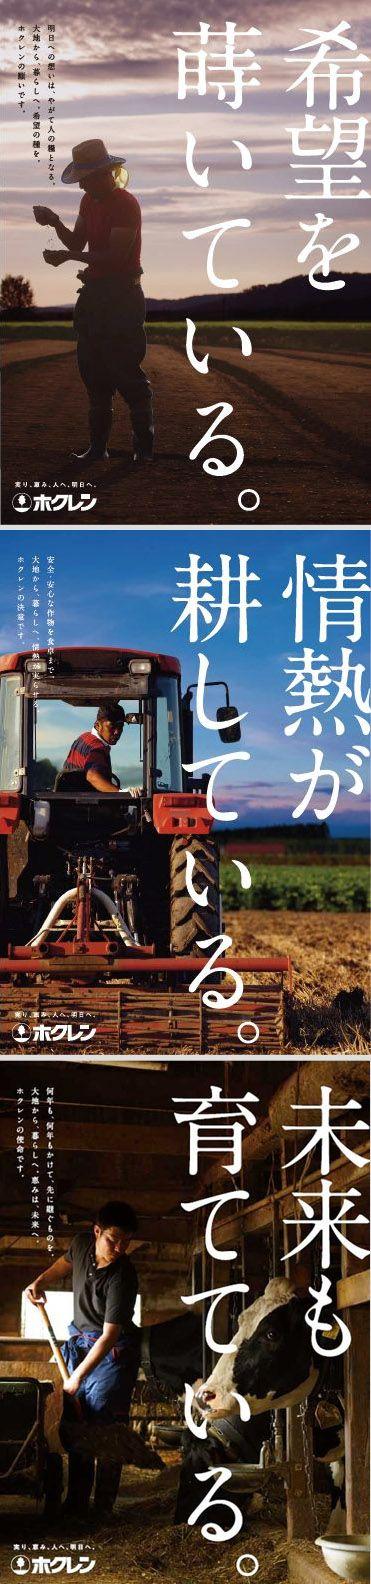 advertising set | Hokuren Federation of Agricultural Cooperatives ホクレン農業協同組合連合会   #japan #japanese